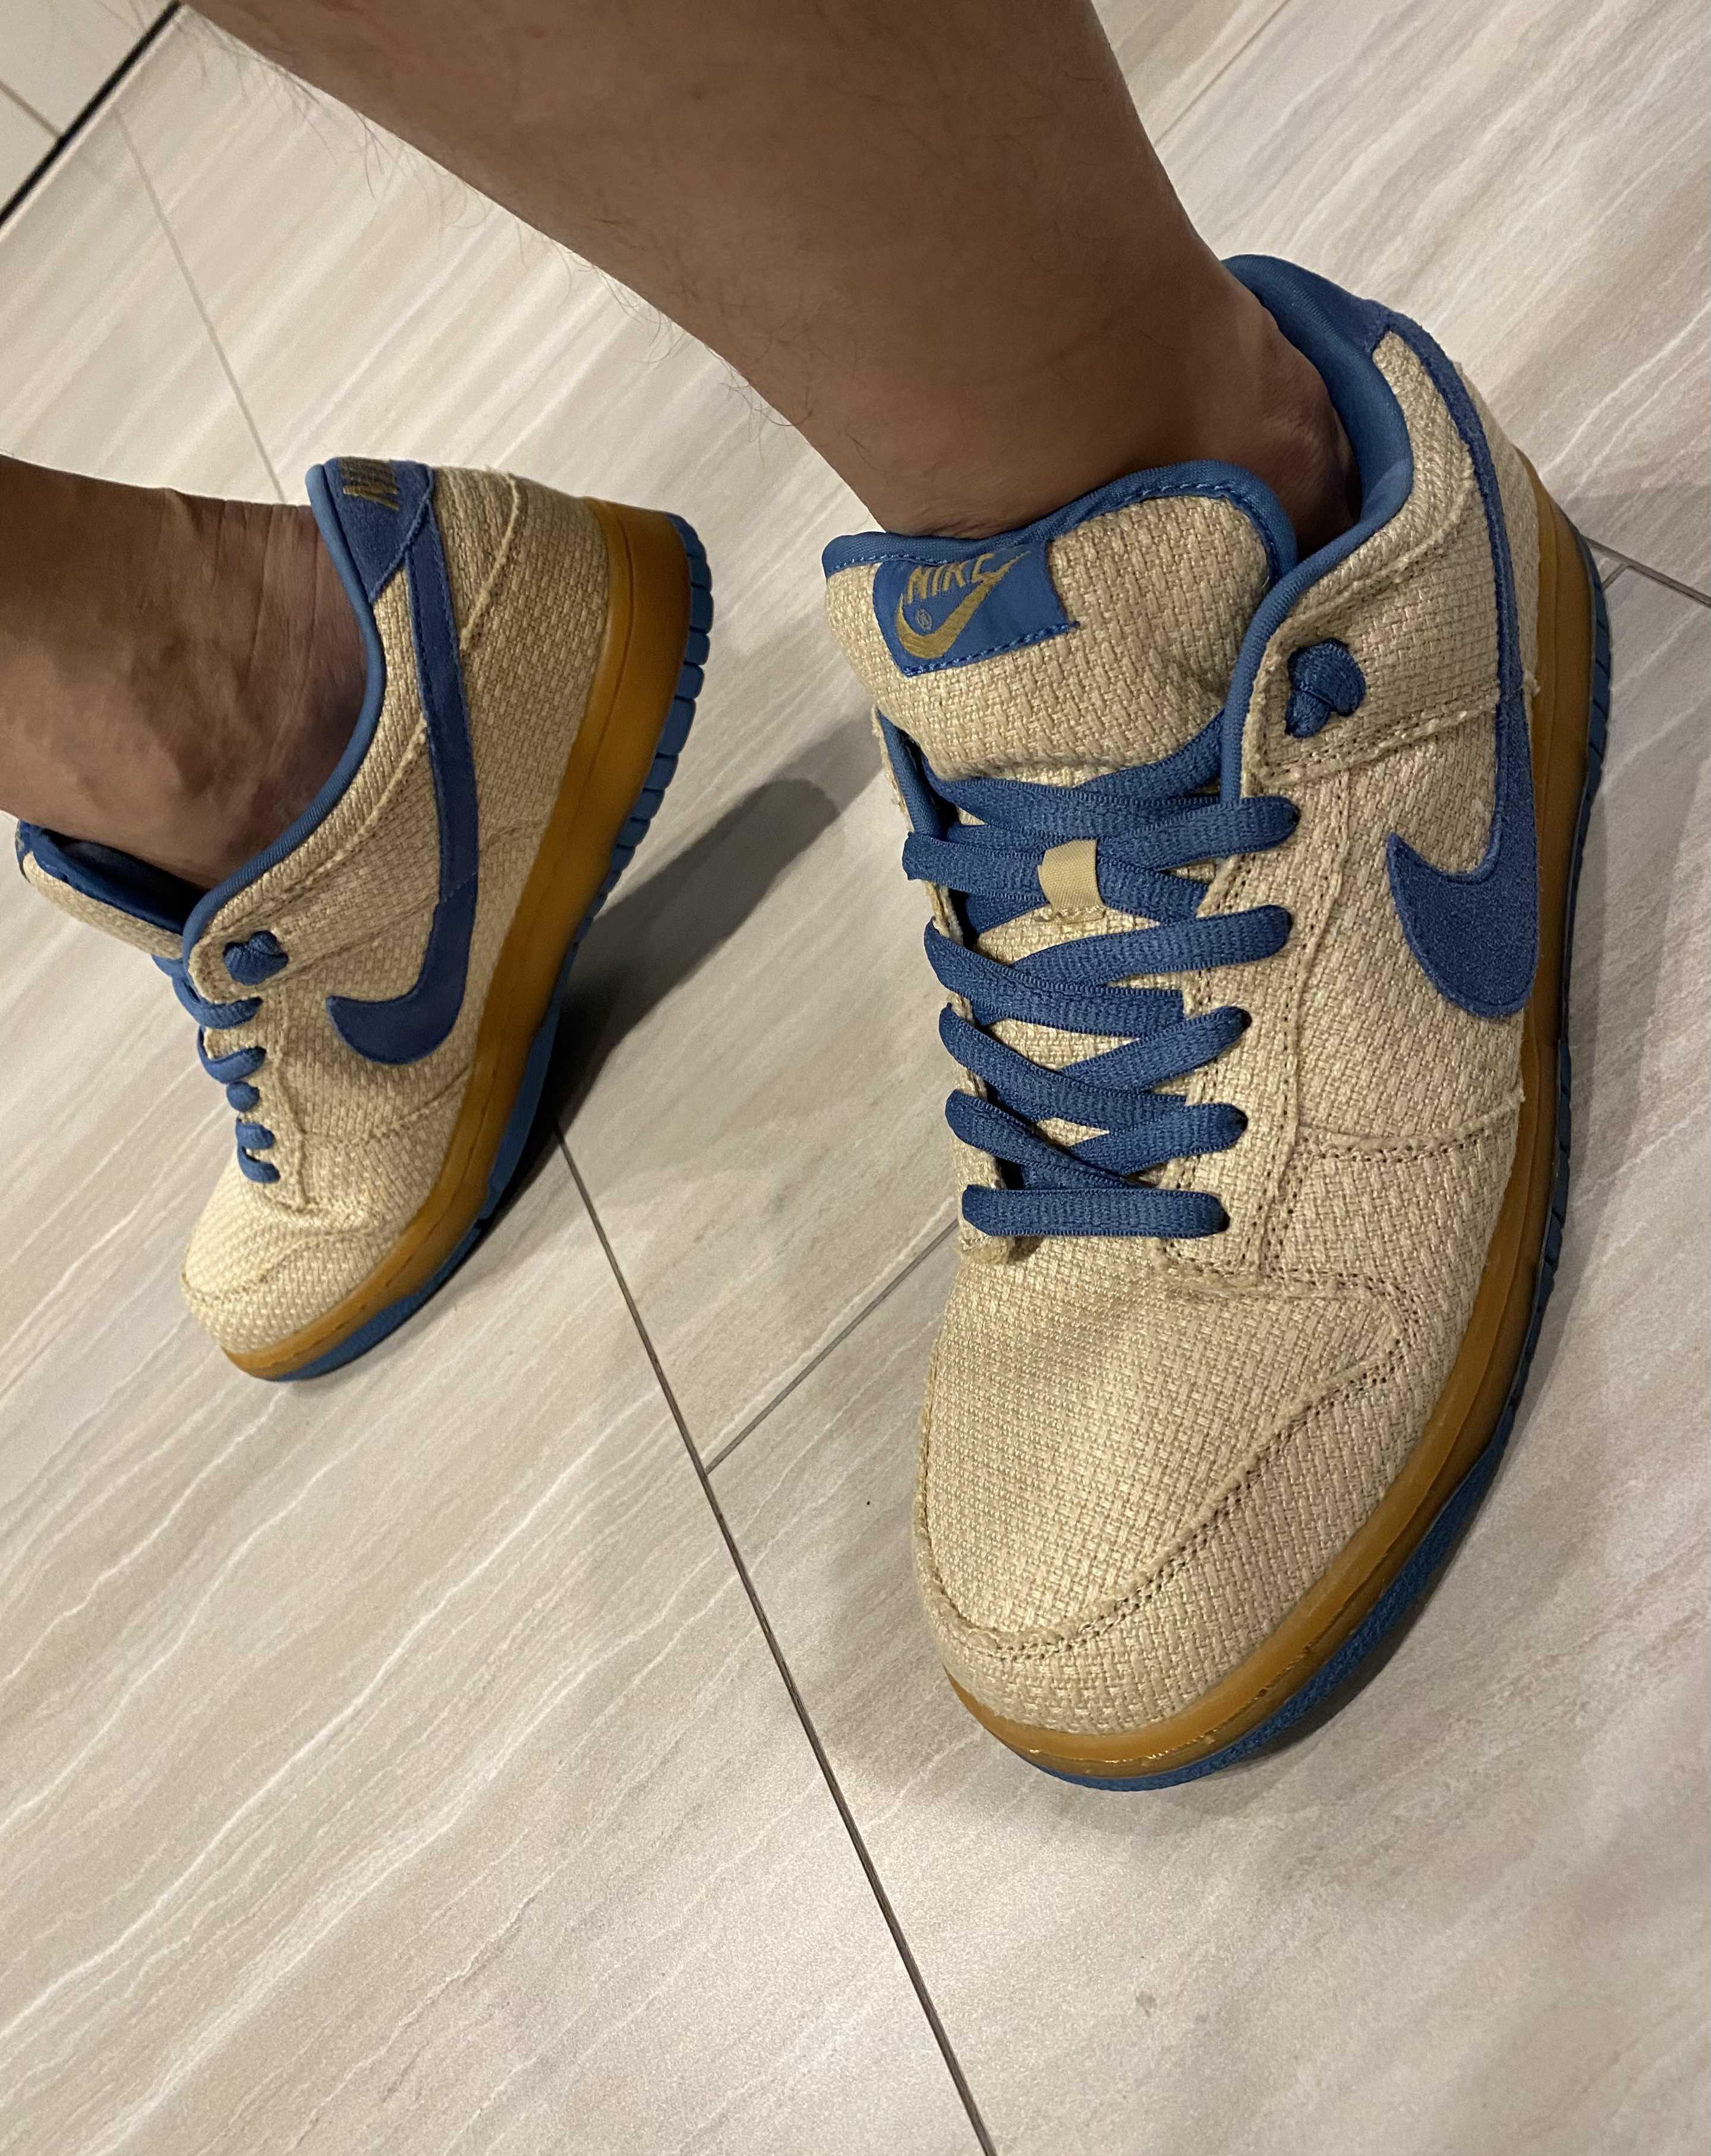 Nike SB DUNK Low Hemp Blue